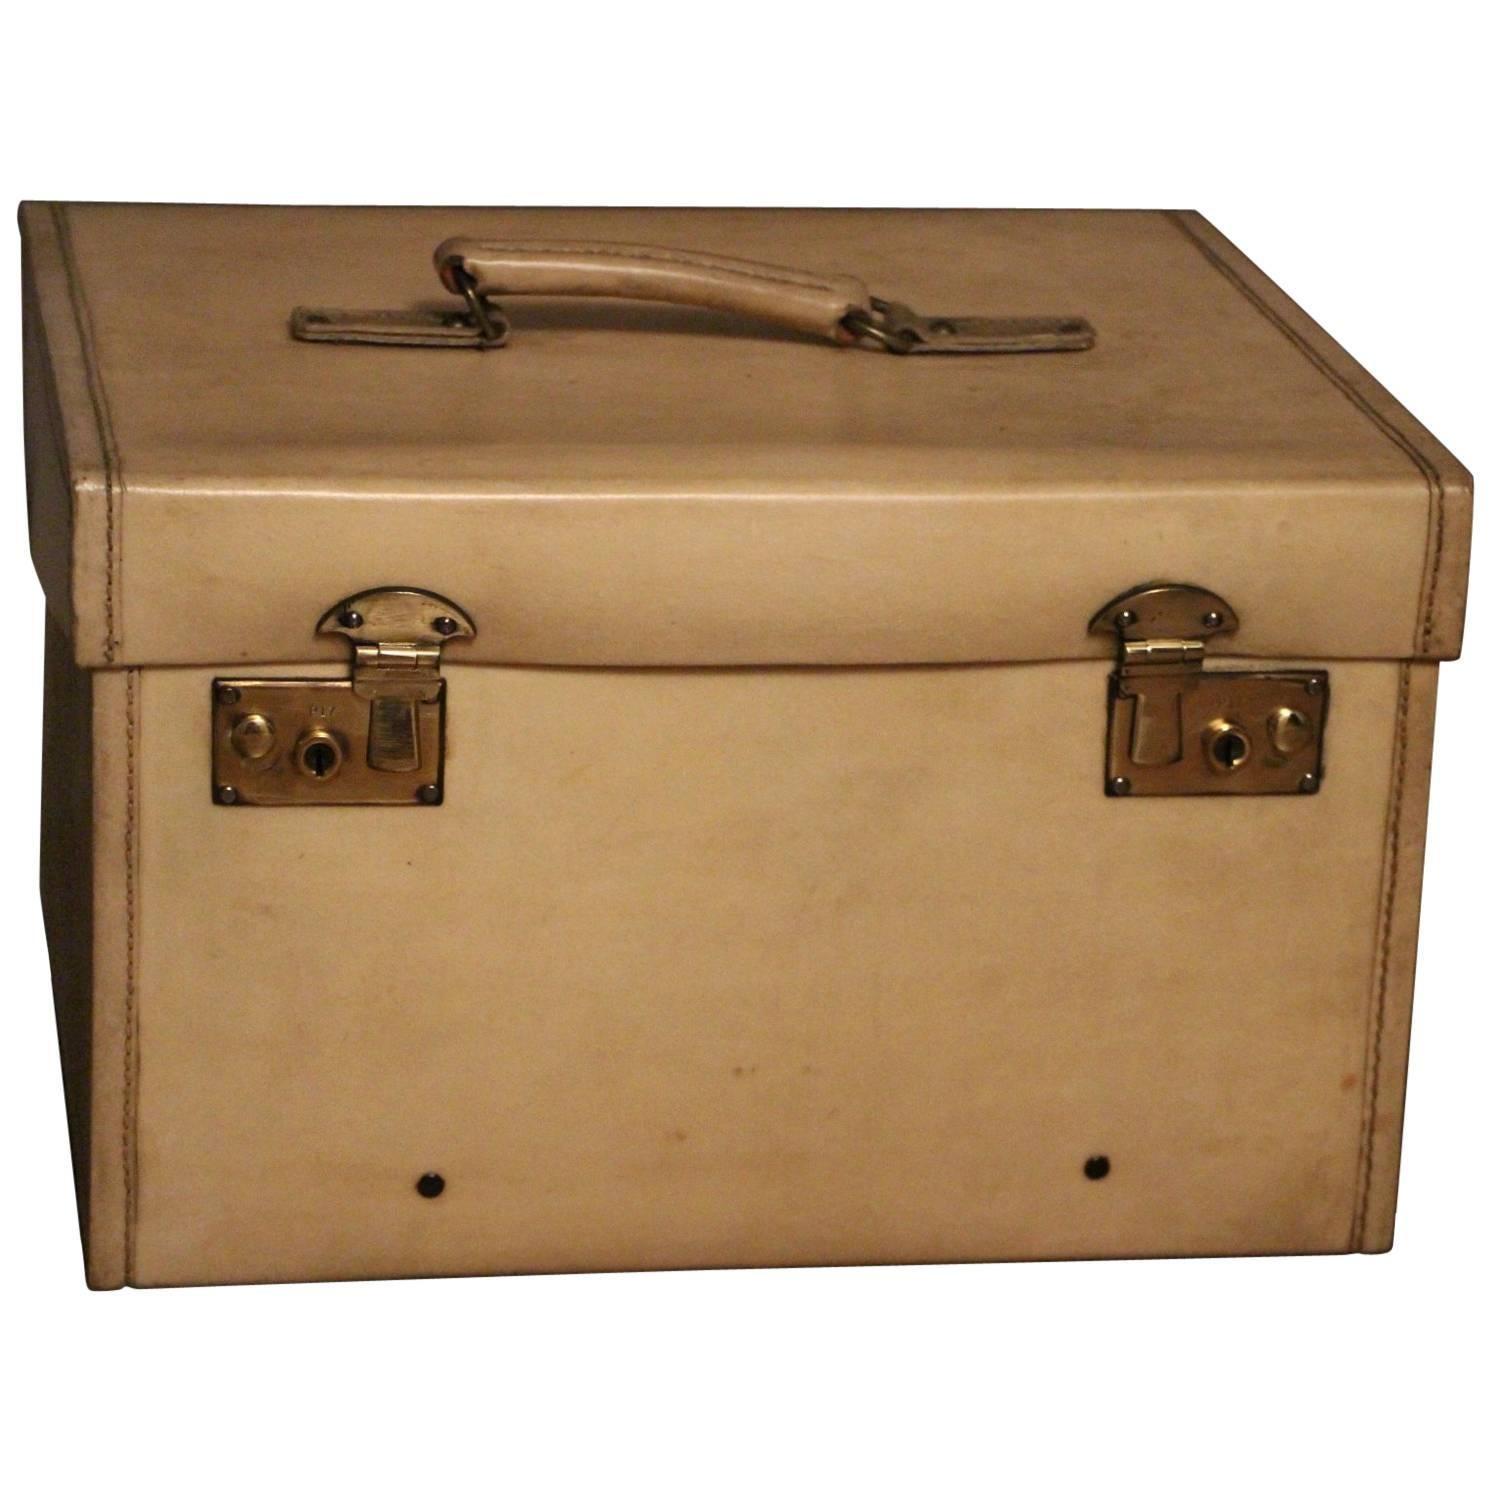 1920s Small Beige Vellum Steamer Trunk